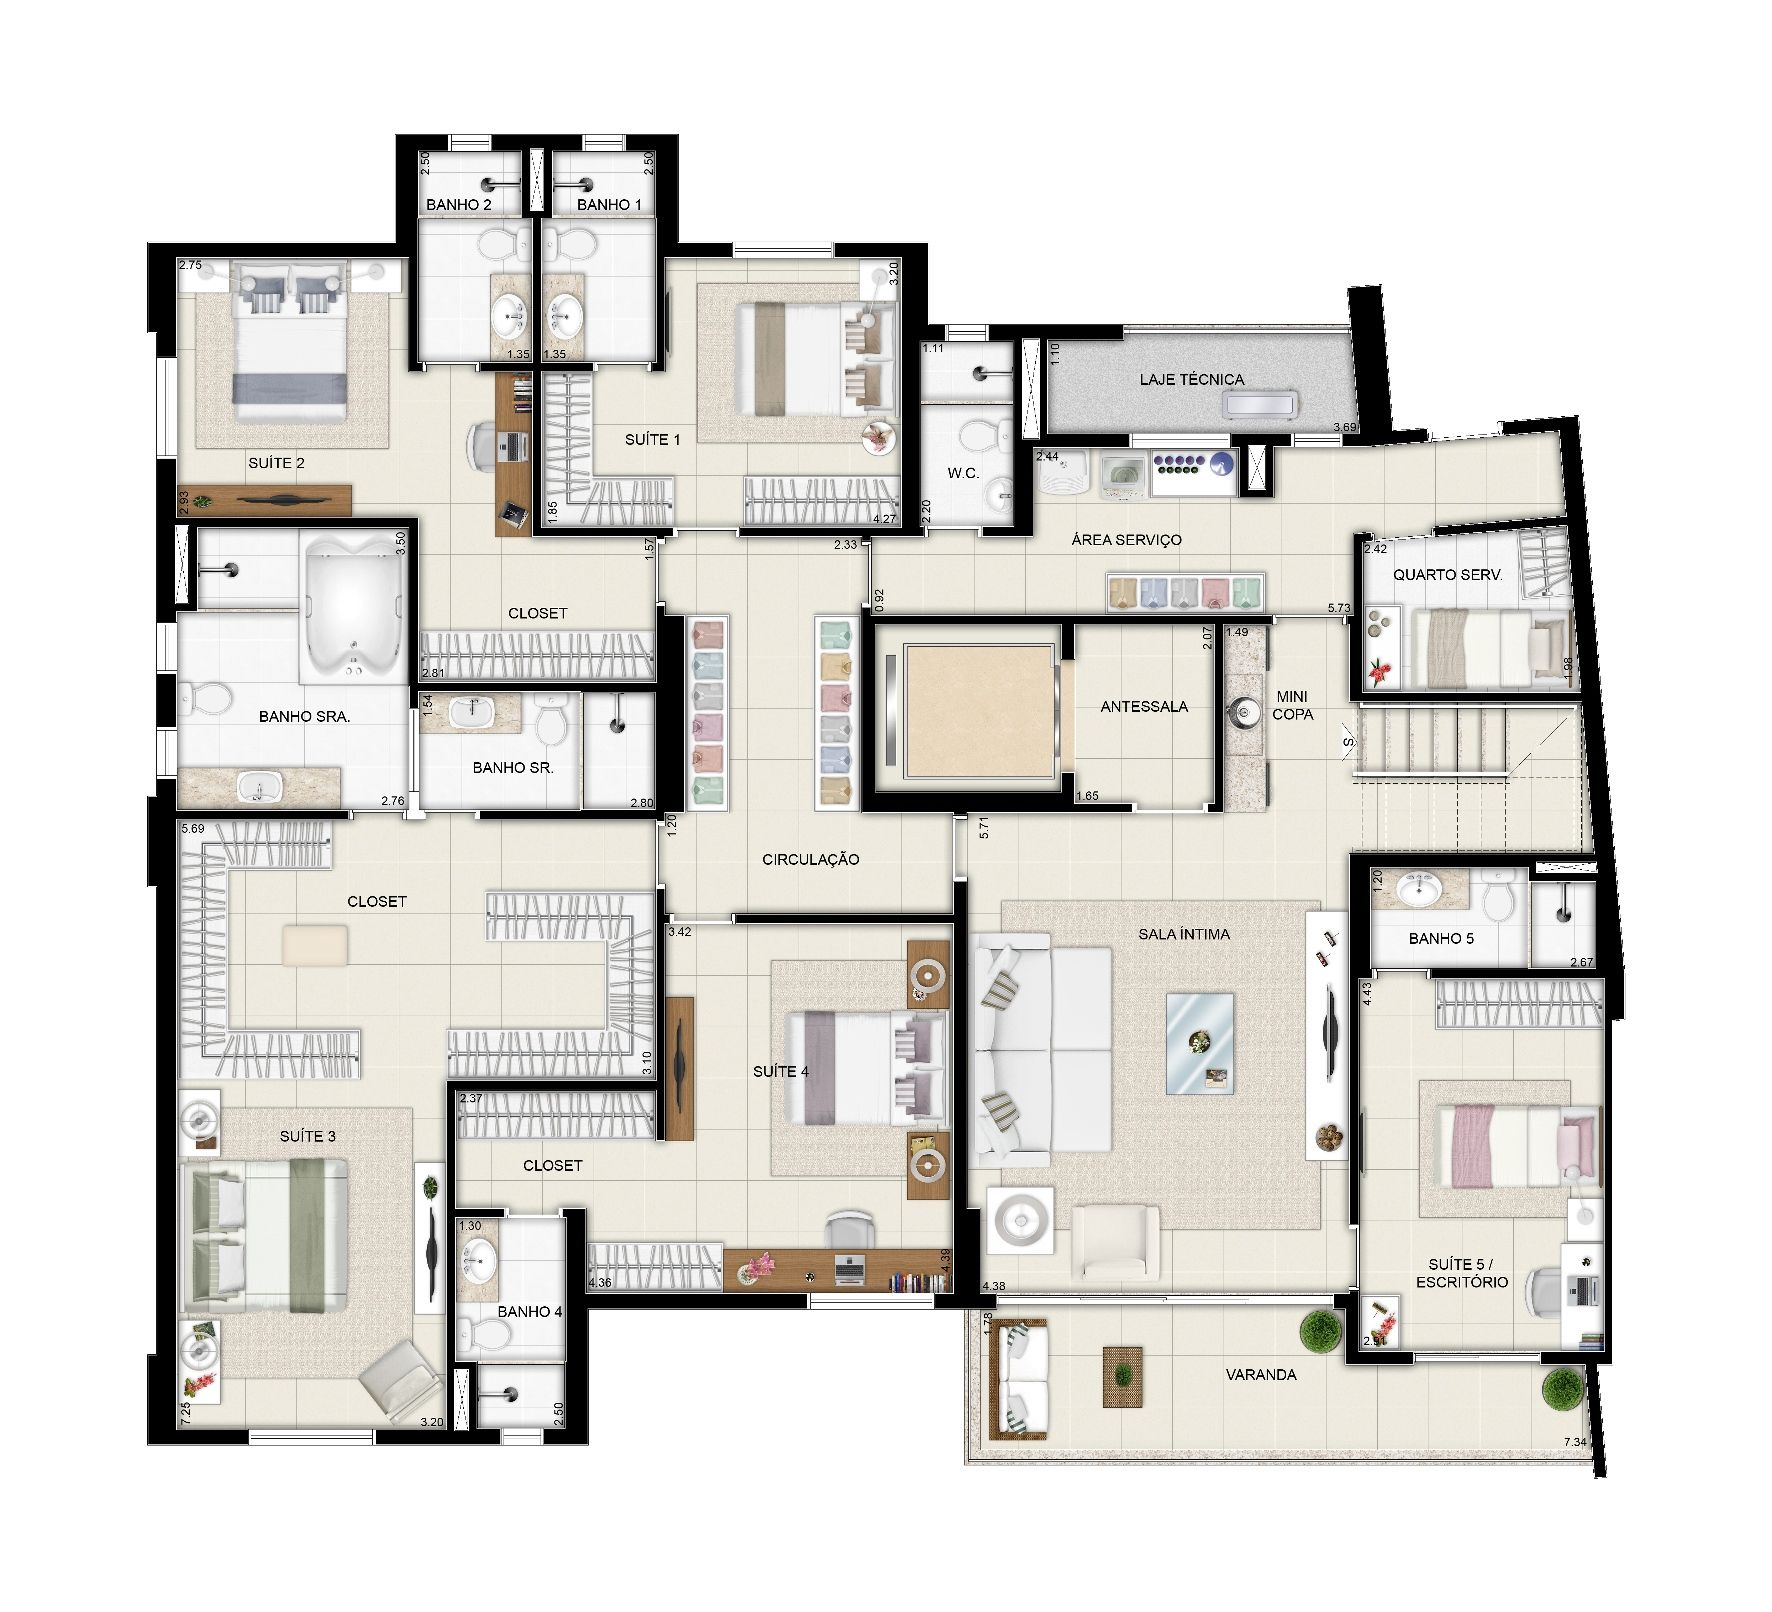 Planta Duplex Inferior Torre Parc Final 01 Lr 114529 G Jpg 1772 1612 Hotel Room Plan Floor Plans House Plans